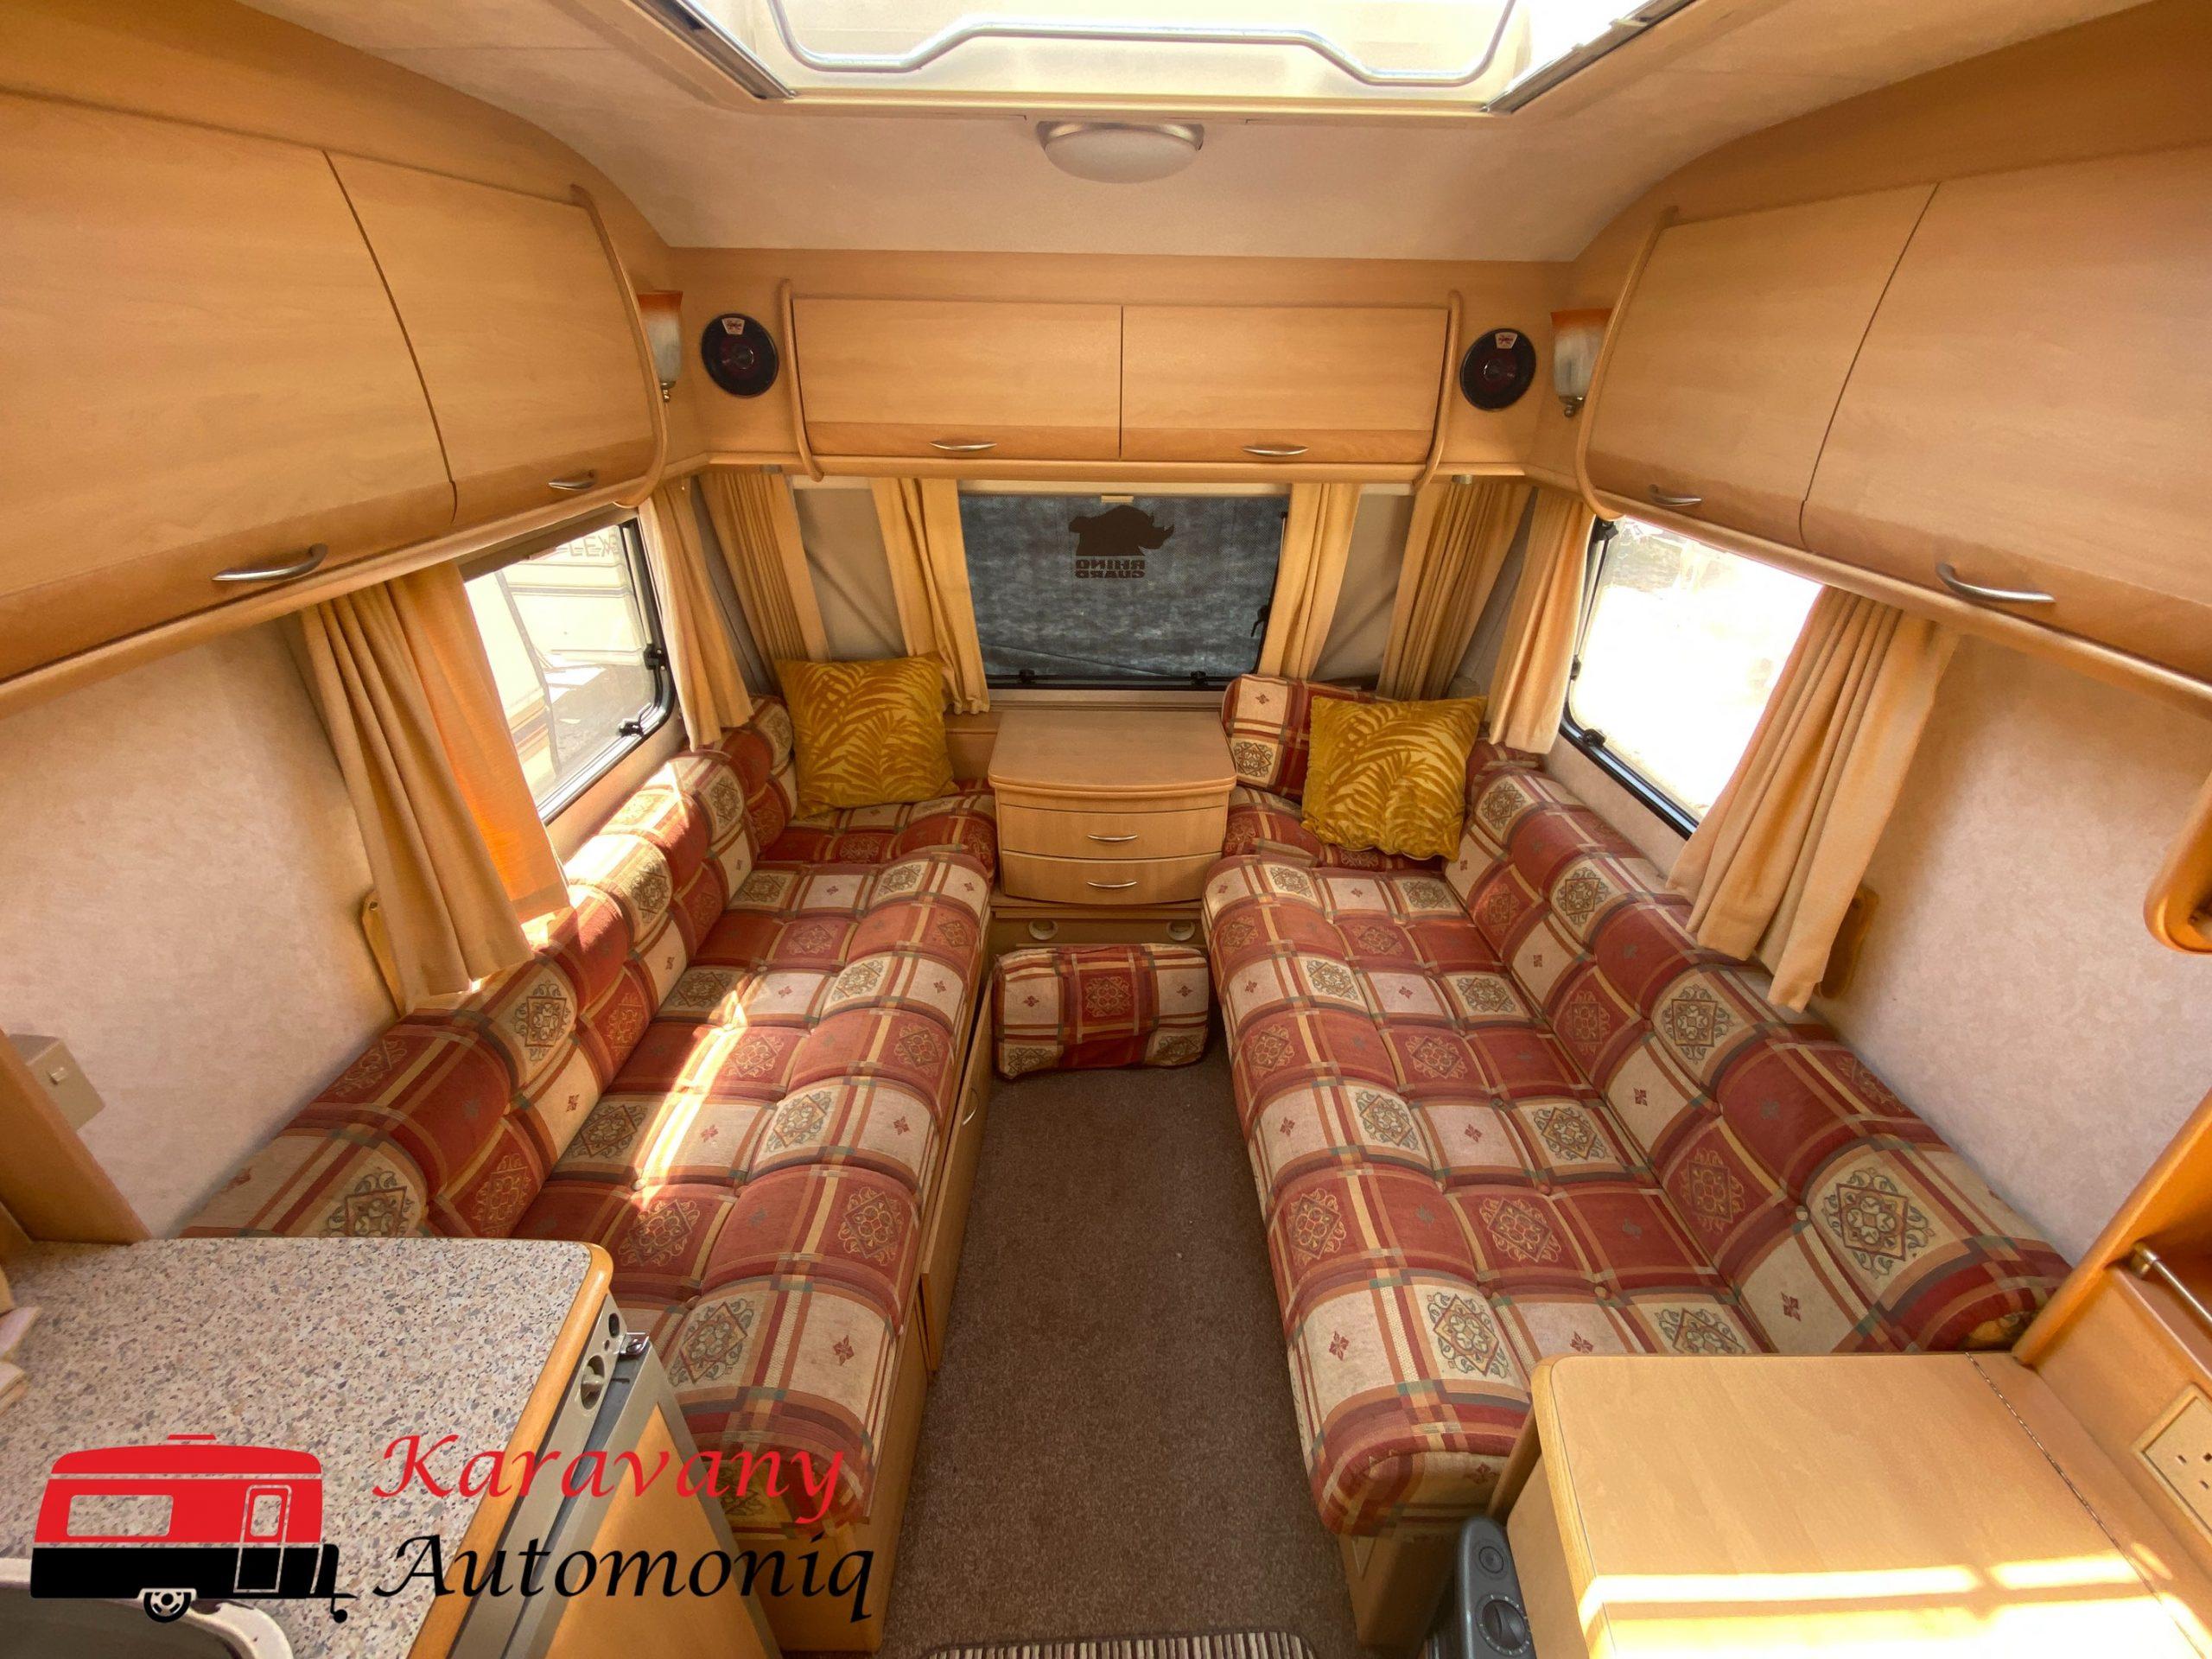 Coachman amara 520/4 Klíma- PREDANÝ!!! Image